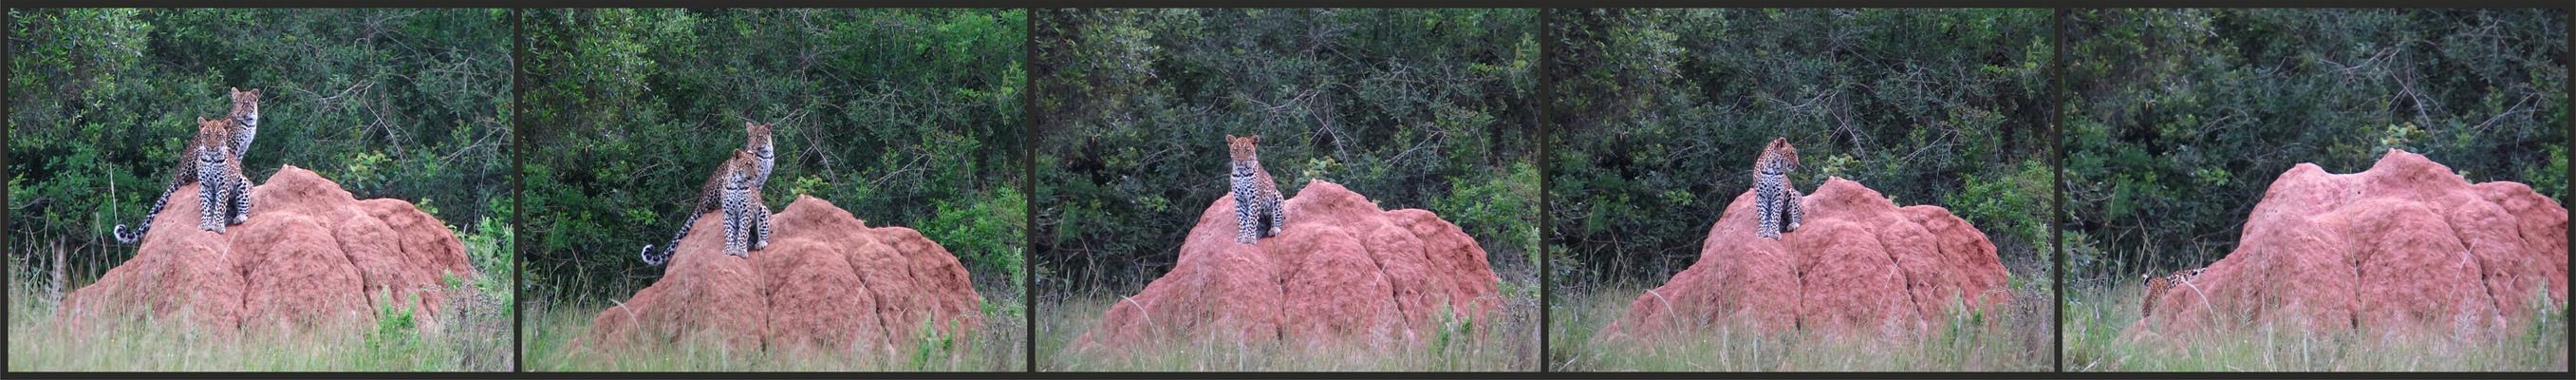 Leoparden - Lake Mburo Nationalpark